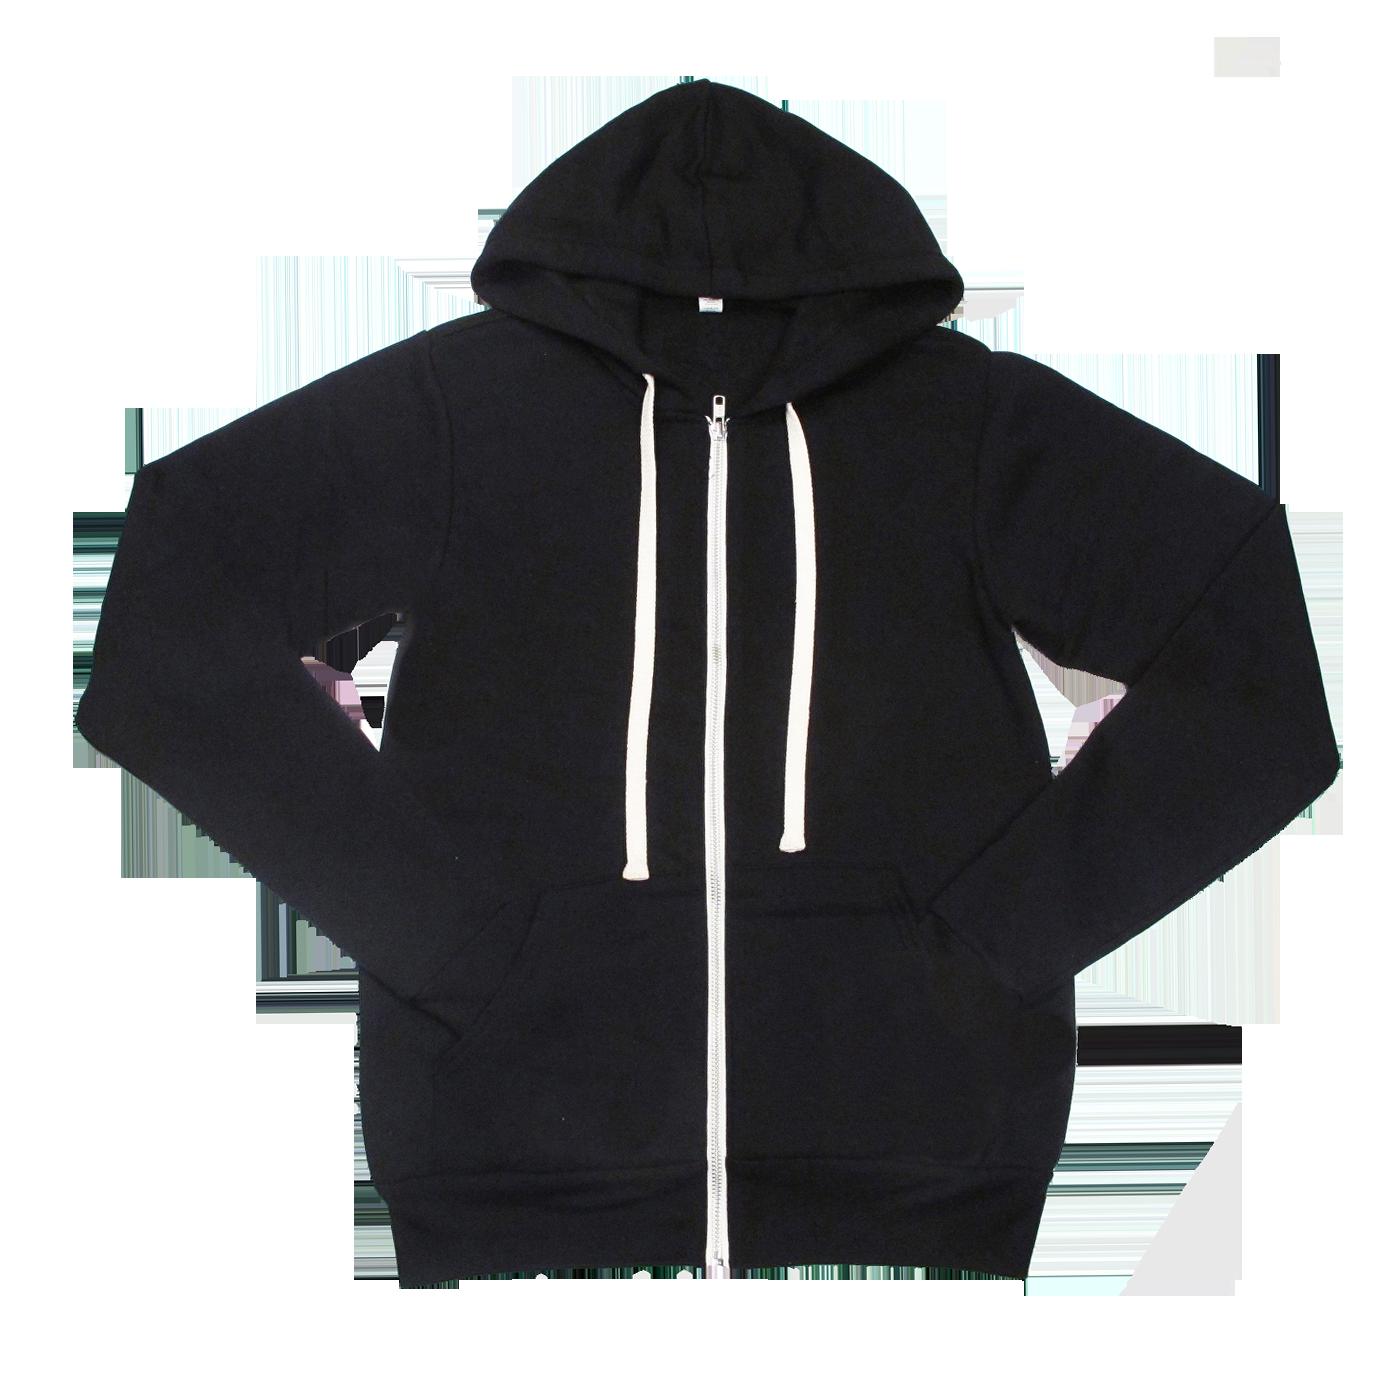 Black Unisex Tri Blend Zip Up